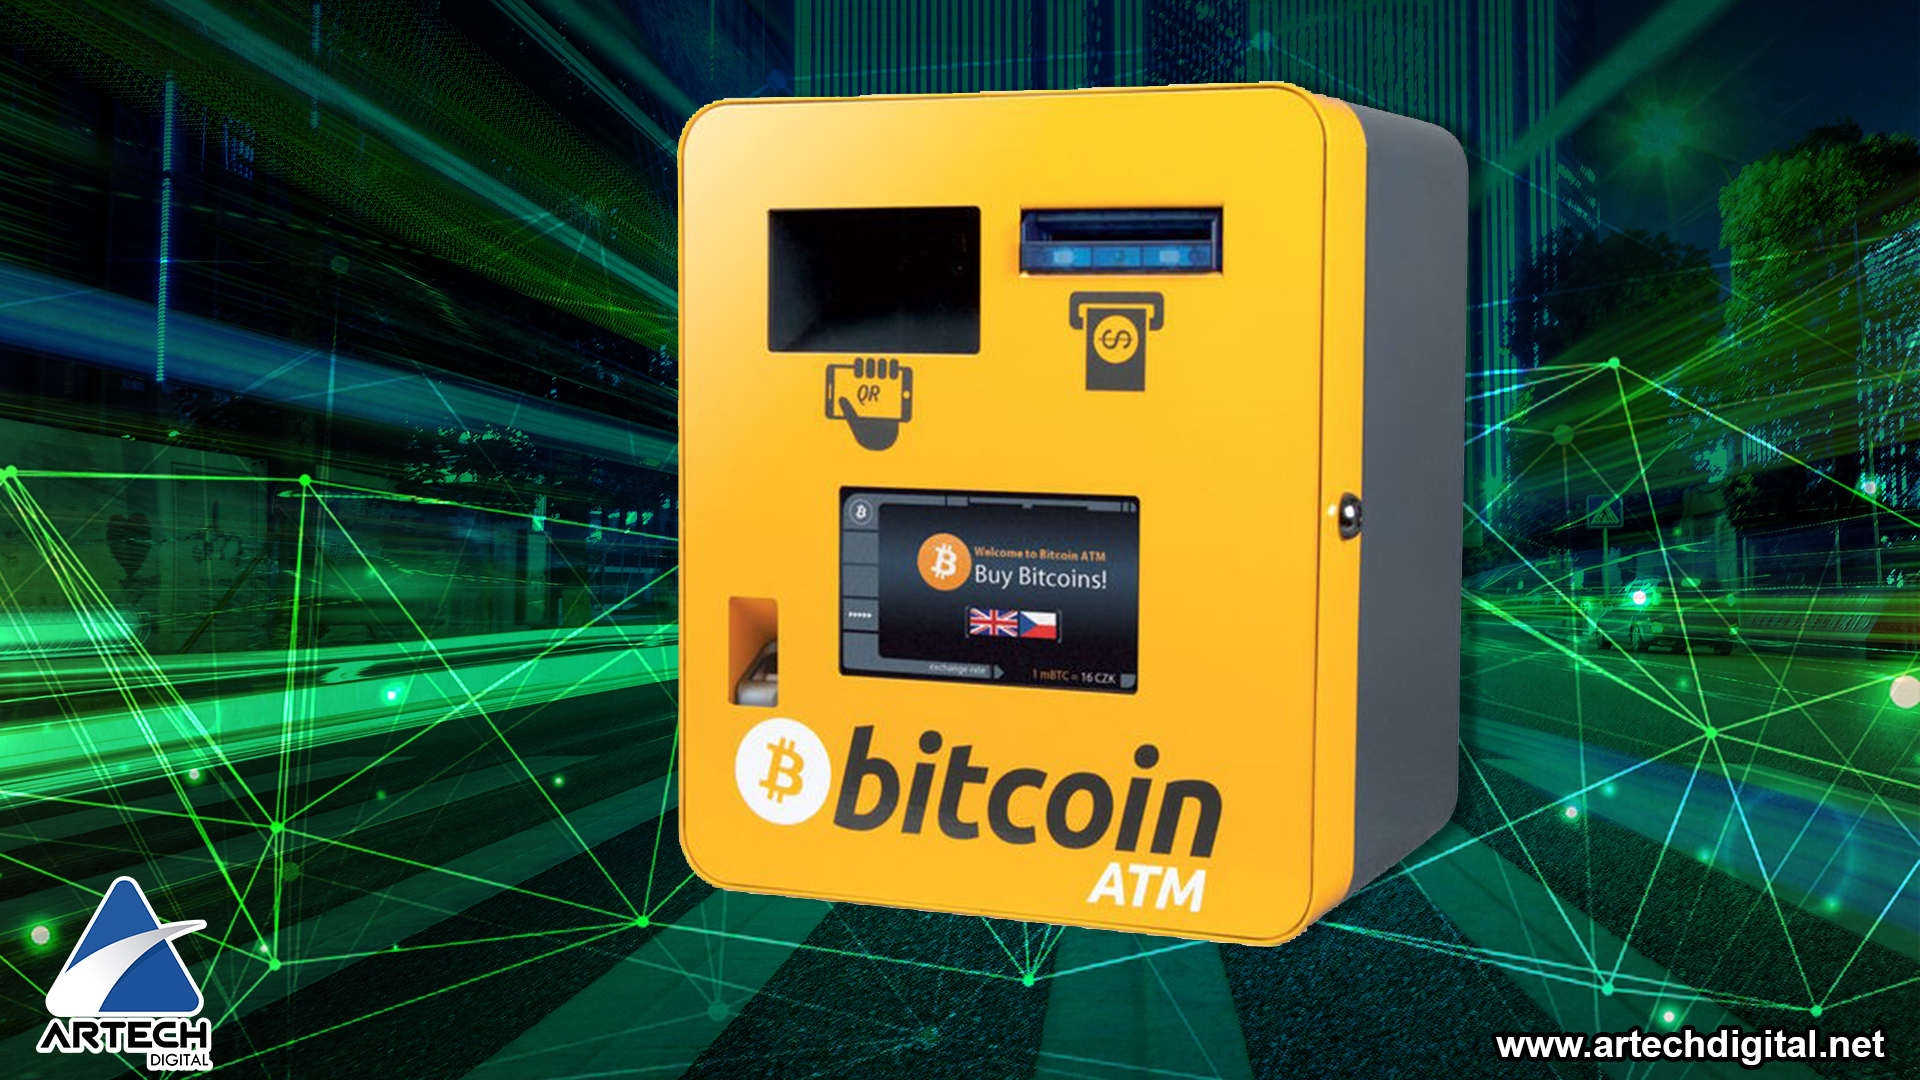 cajeros-automaticos-bitcoin-artech-digital